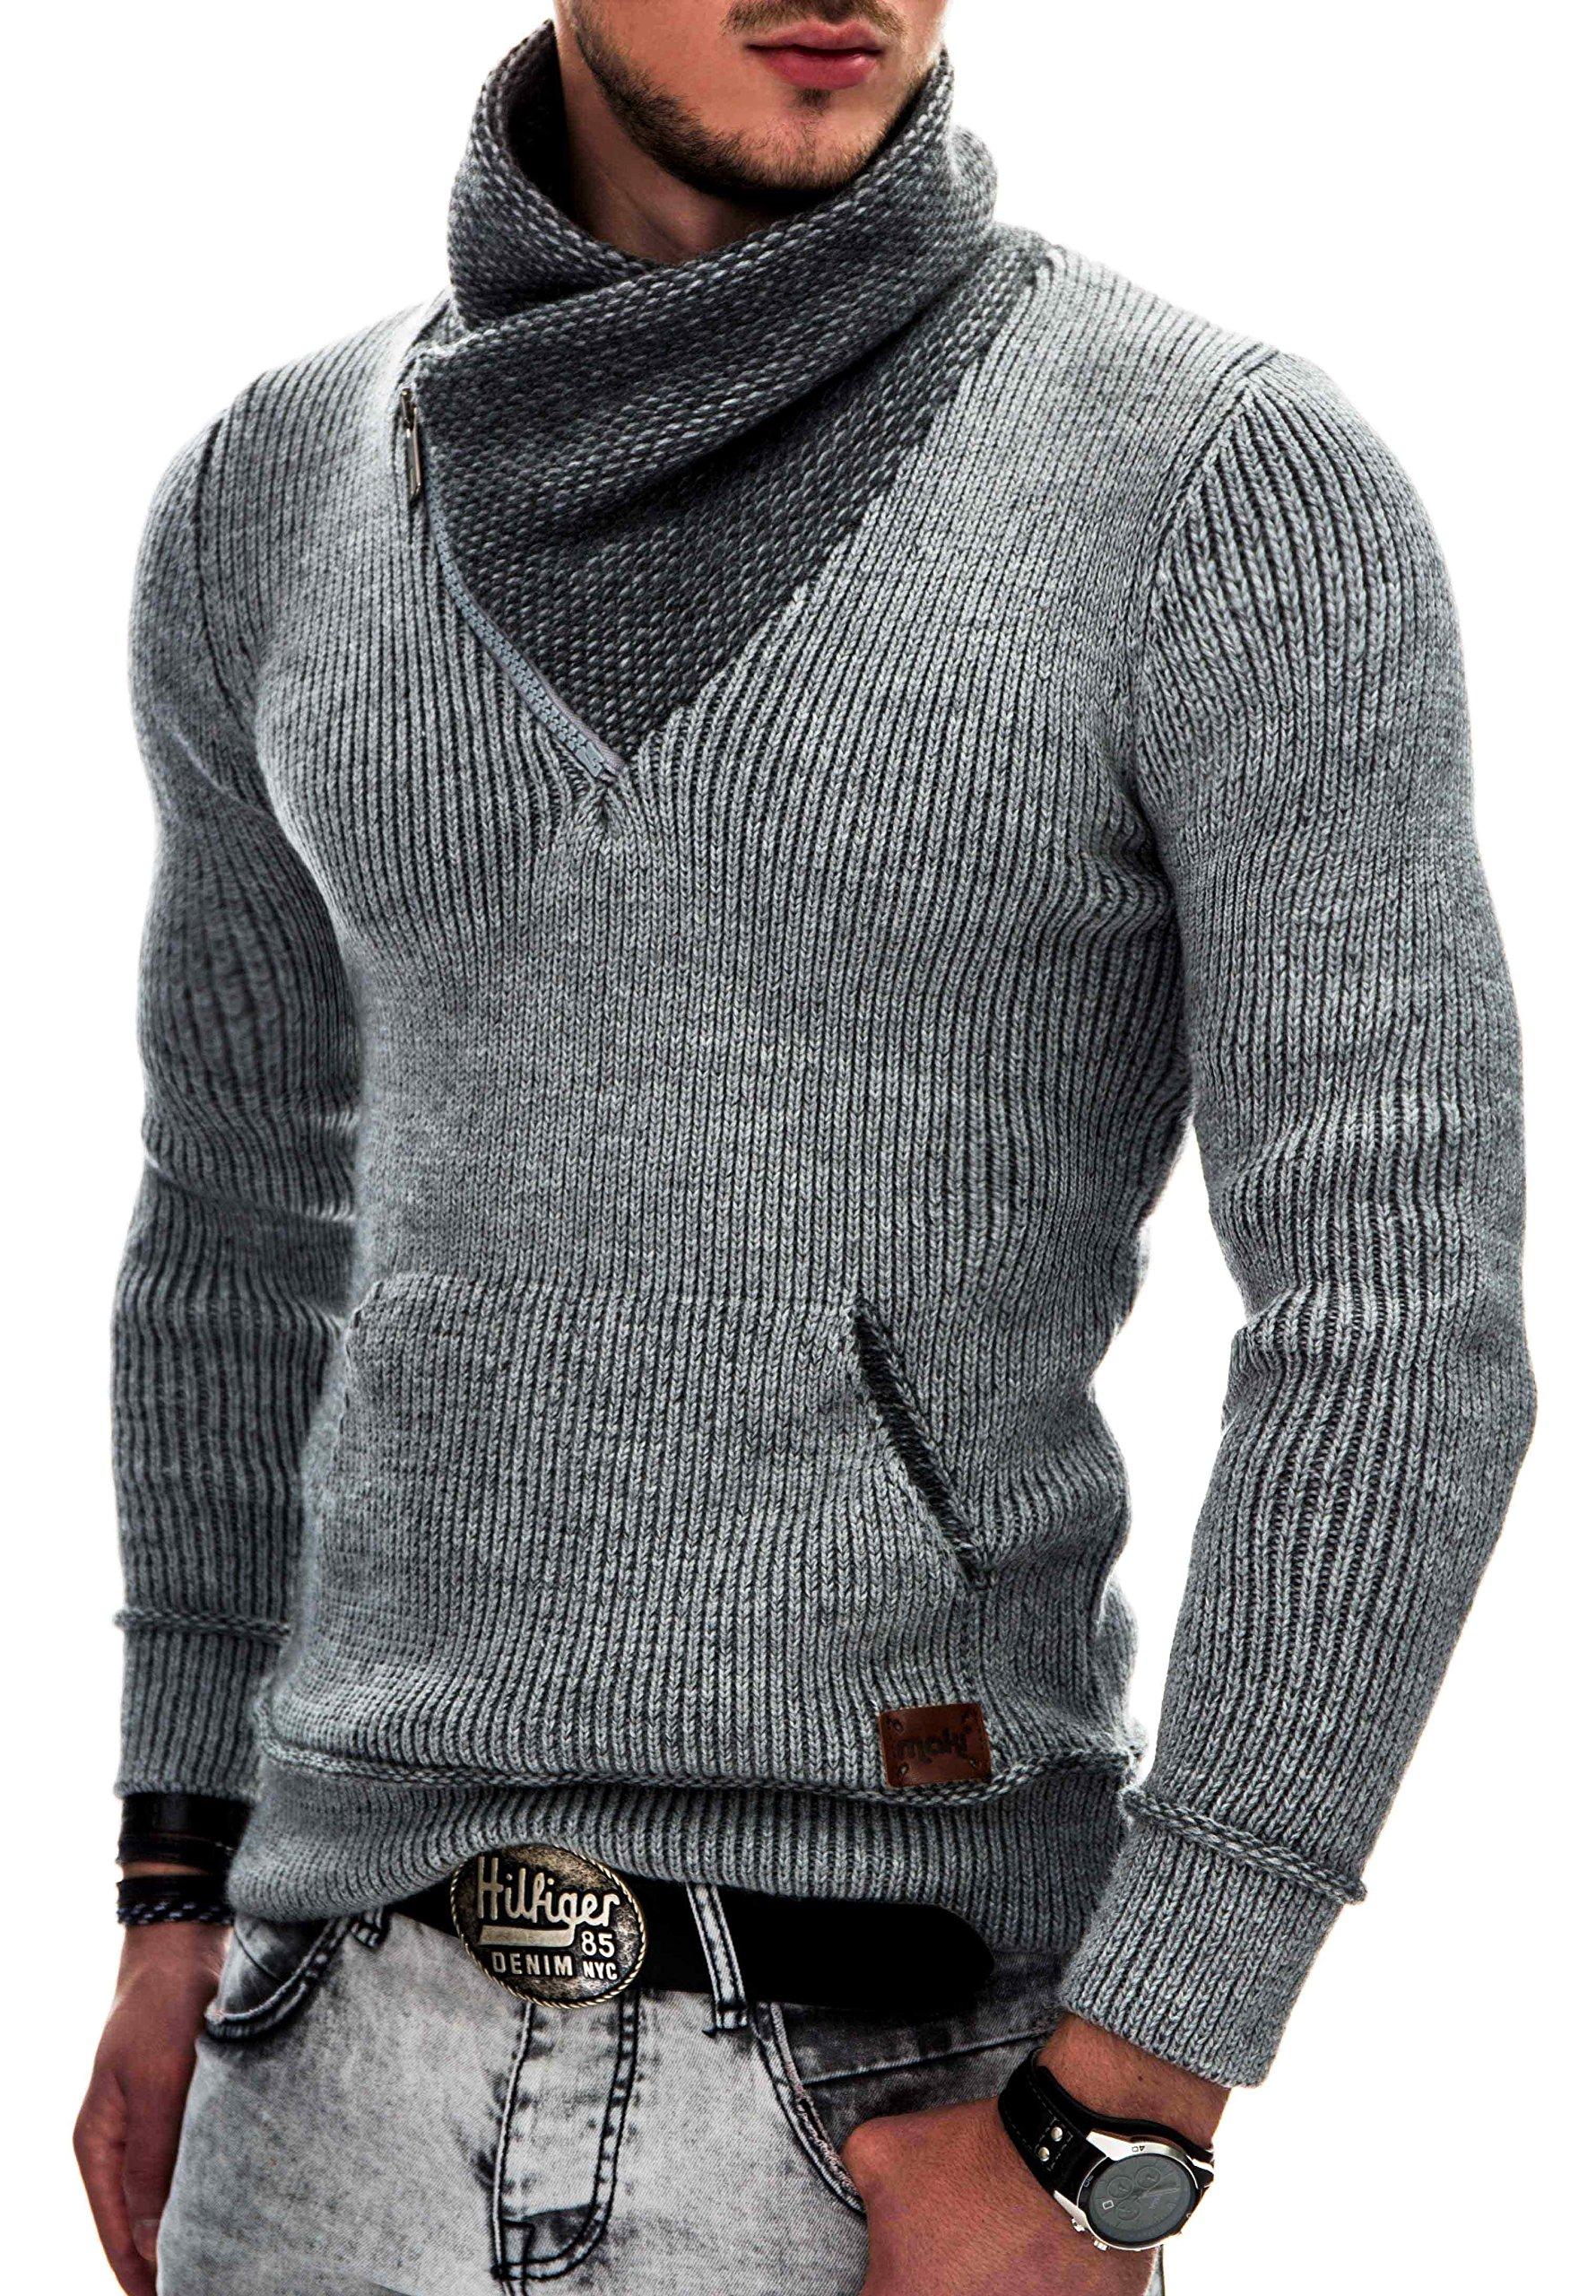 INDICODE Hombre Suéter Tejido Sudadera con capucha Cárdigans Pullover Jerséis Knit Sweater Sweatshirt 35-114 S M L XL XXL